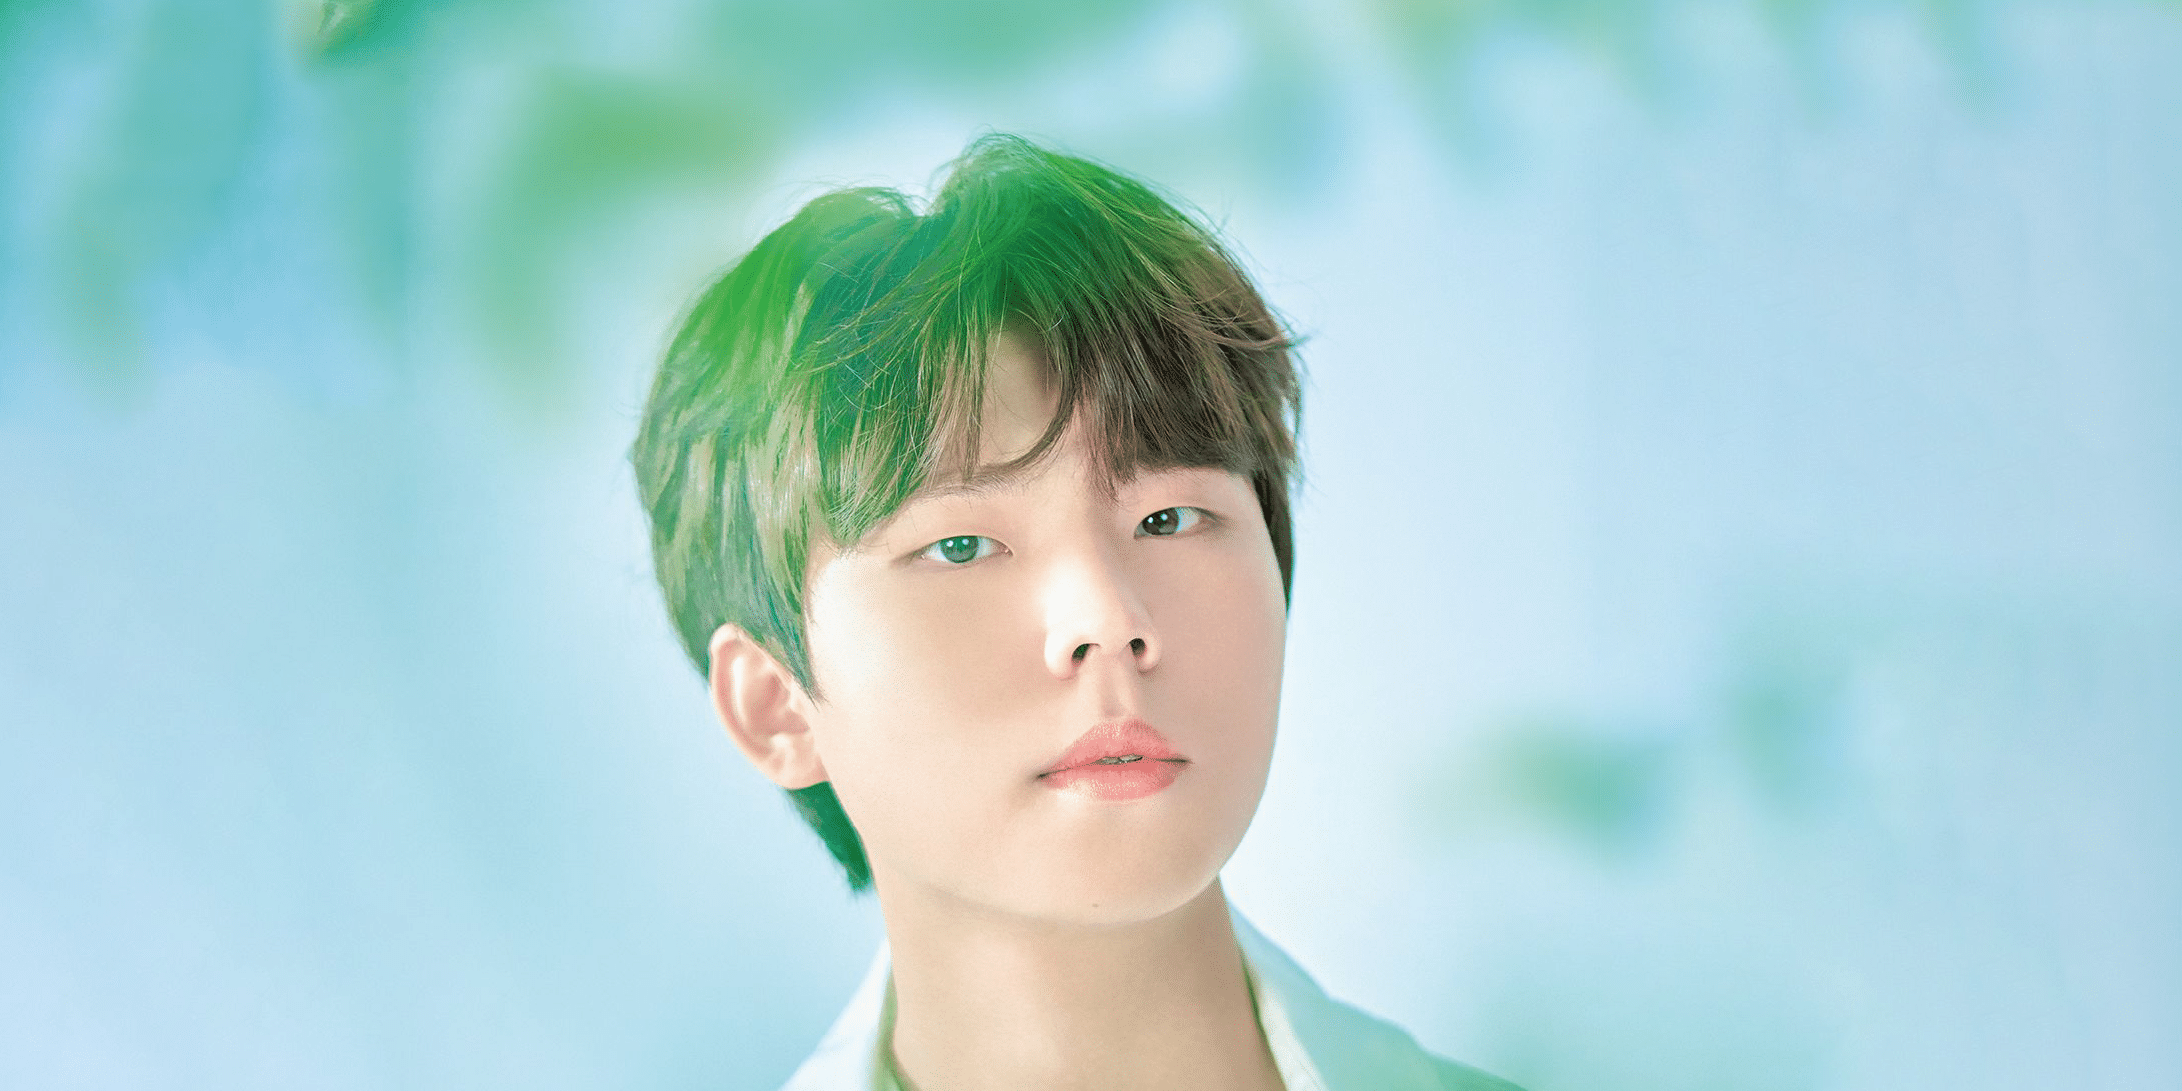 Jung Seung Hwan - Age, Height, Net Worth, Parents, Facts, Bio - Kpop Wiki